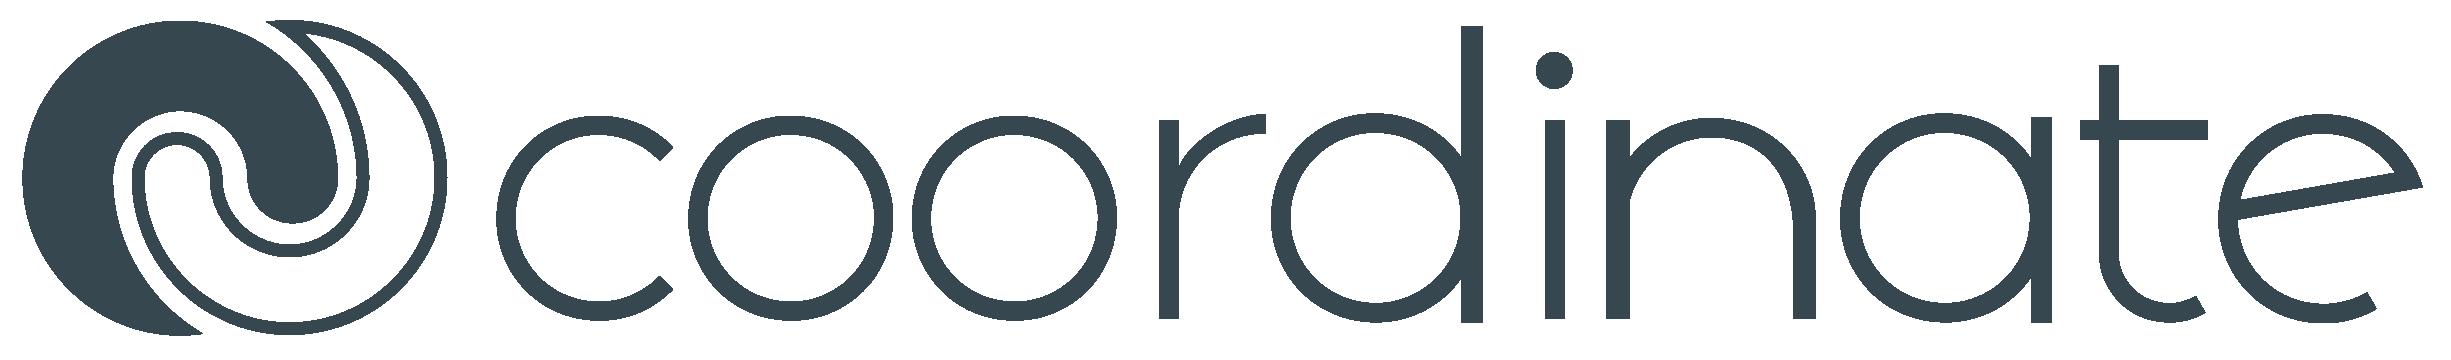 Coordinate logo